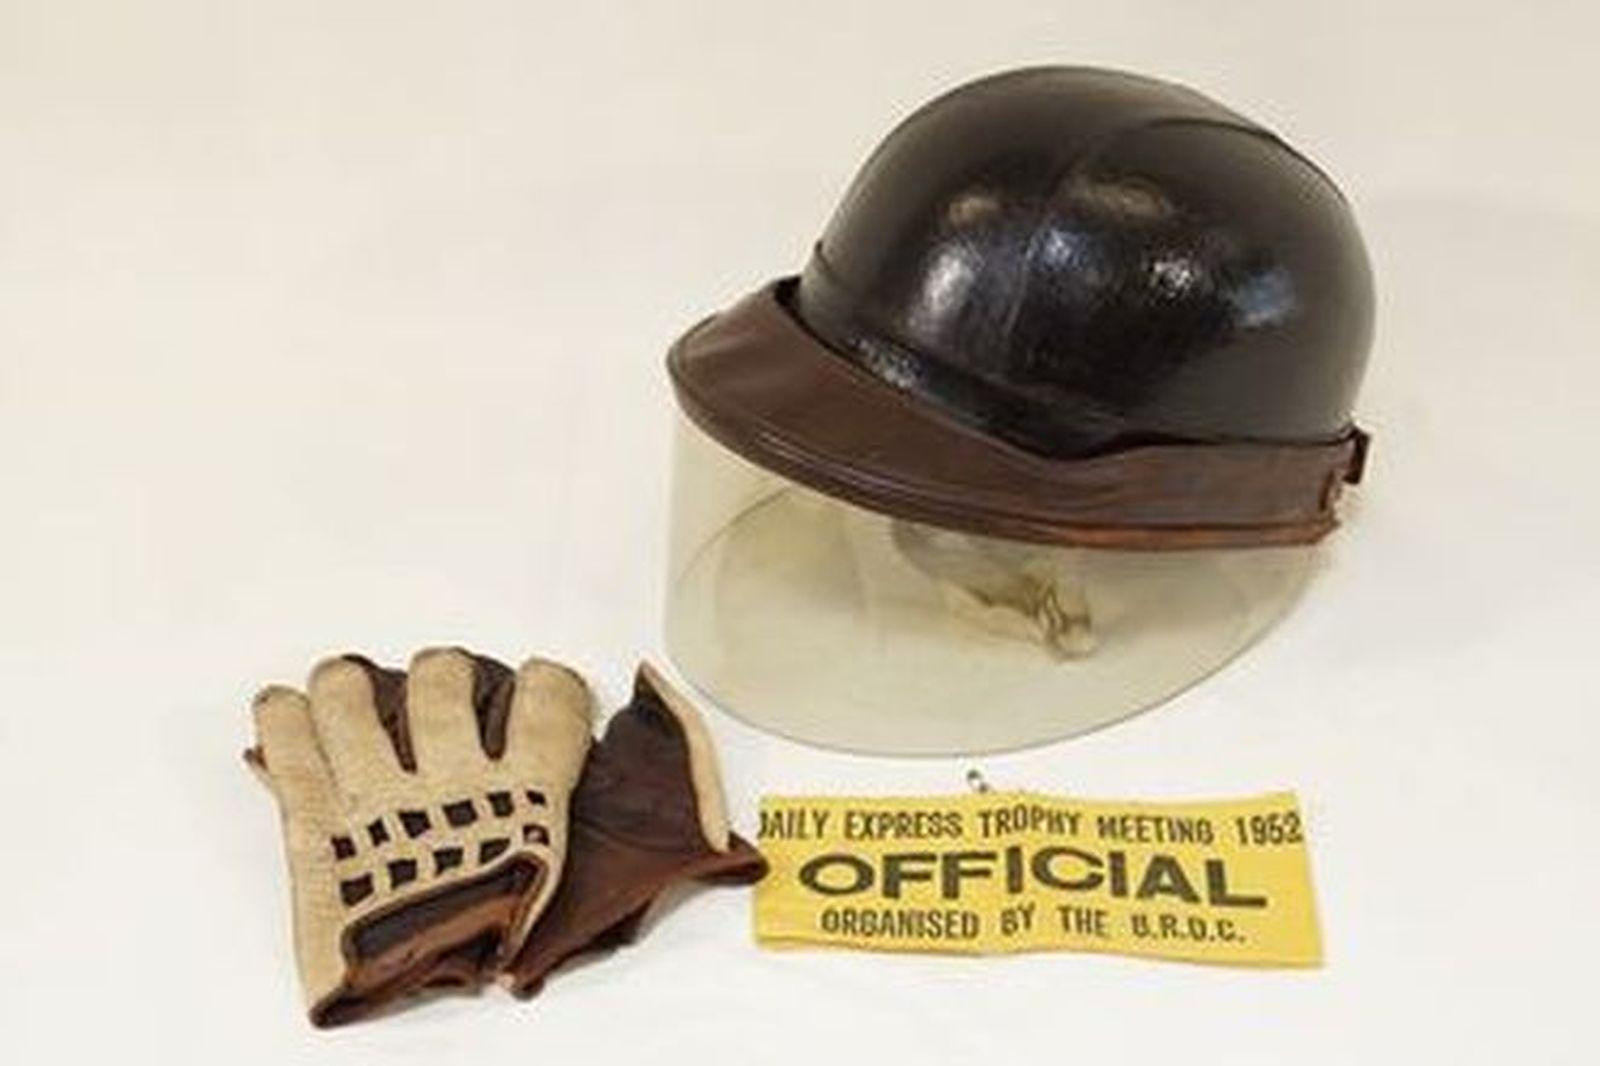 Helmet & Gloves - Standard Everoak helmet with visor, leather gloves & '52 Daily Express Trophy